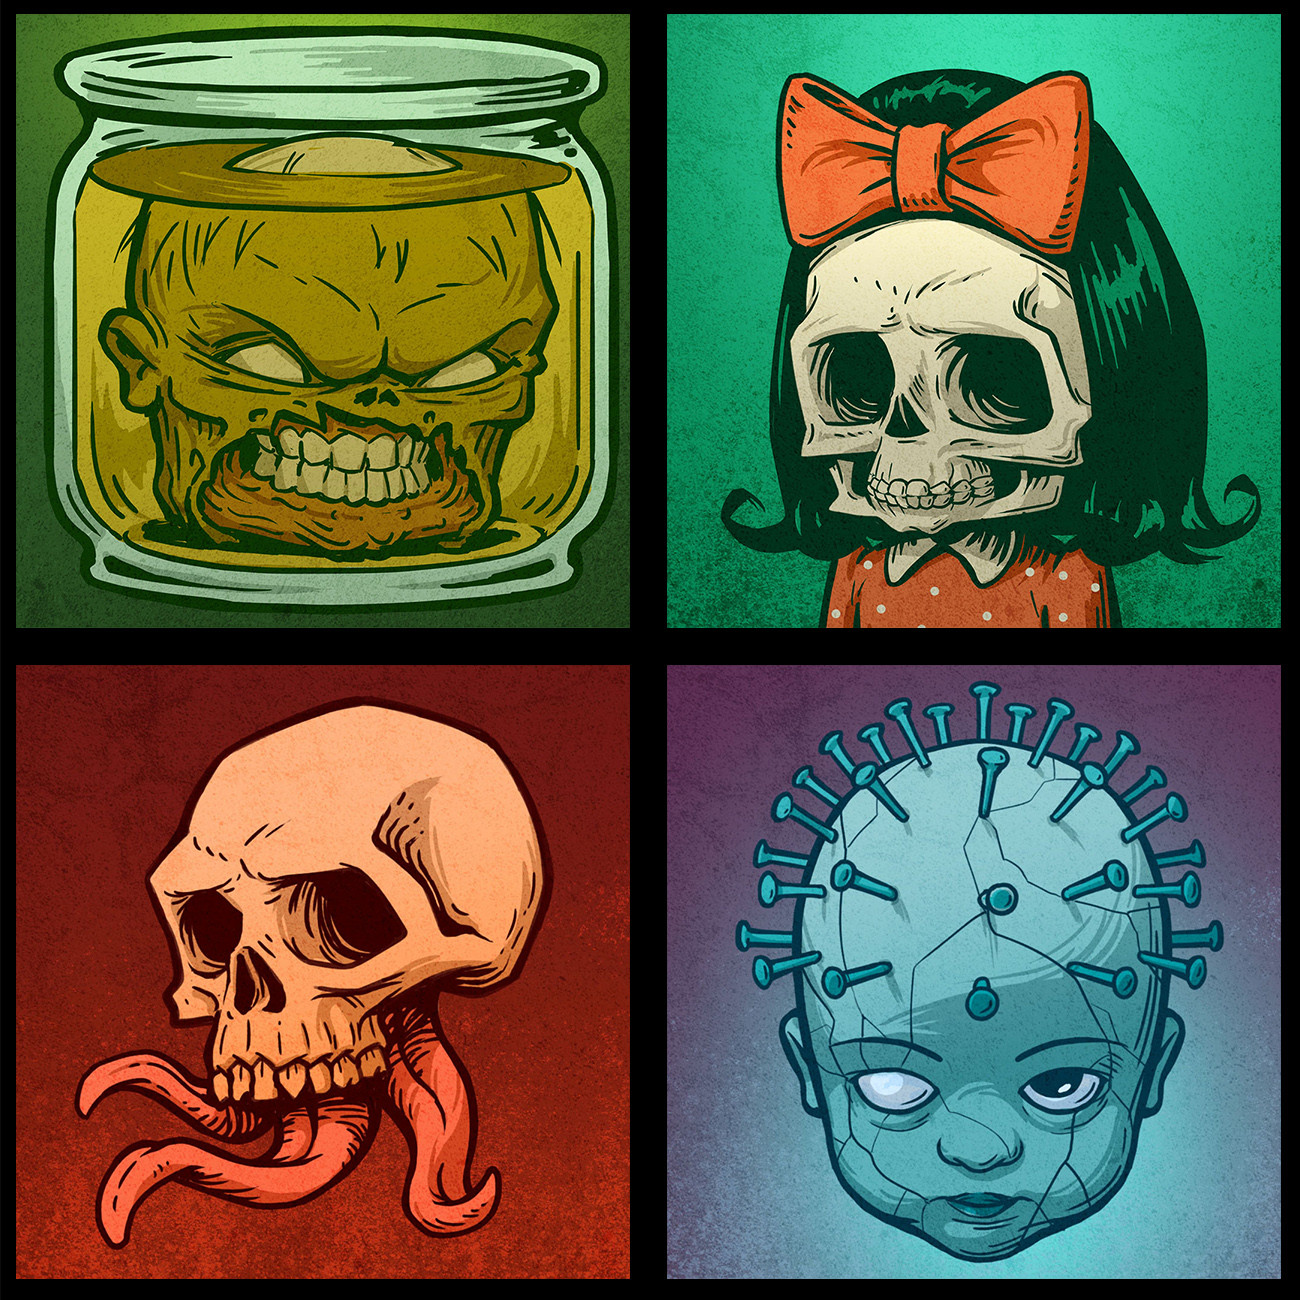 ArtStation - Dying Light: Bad Blood - Player avatars, Emil